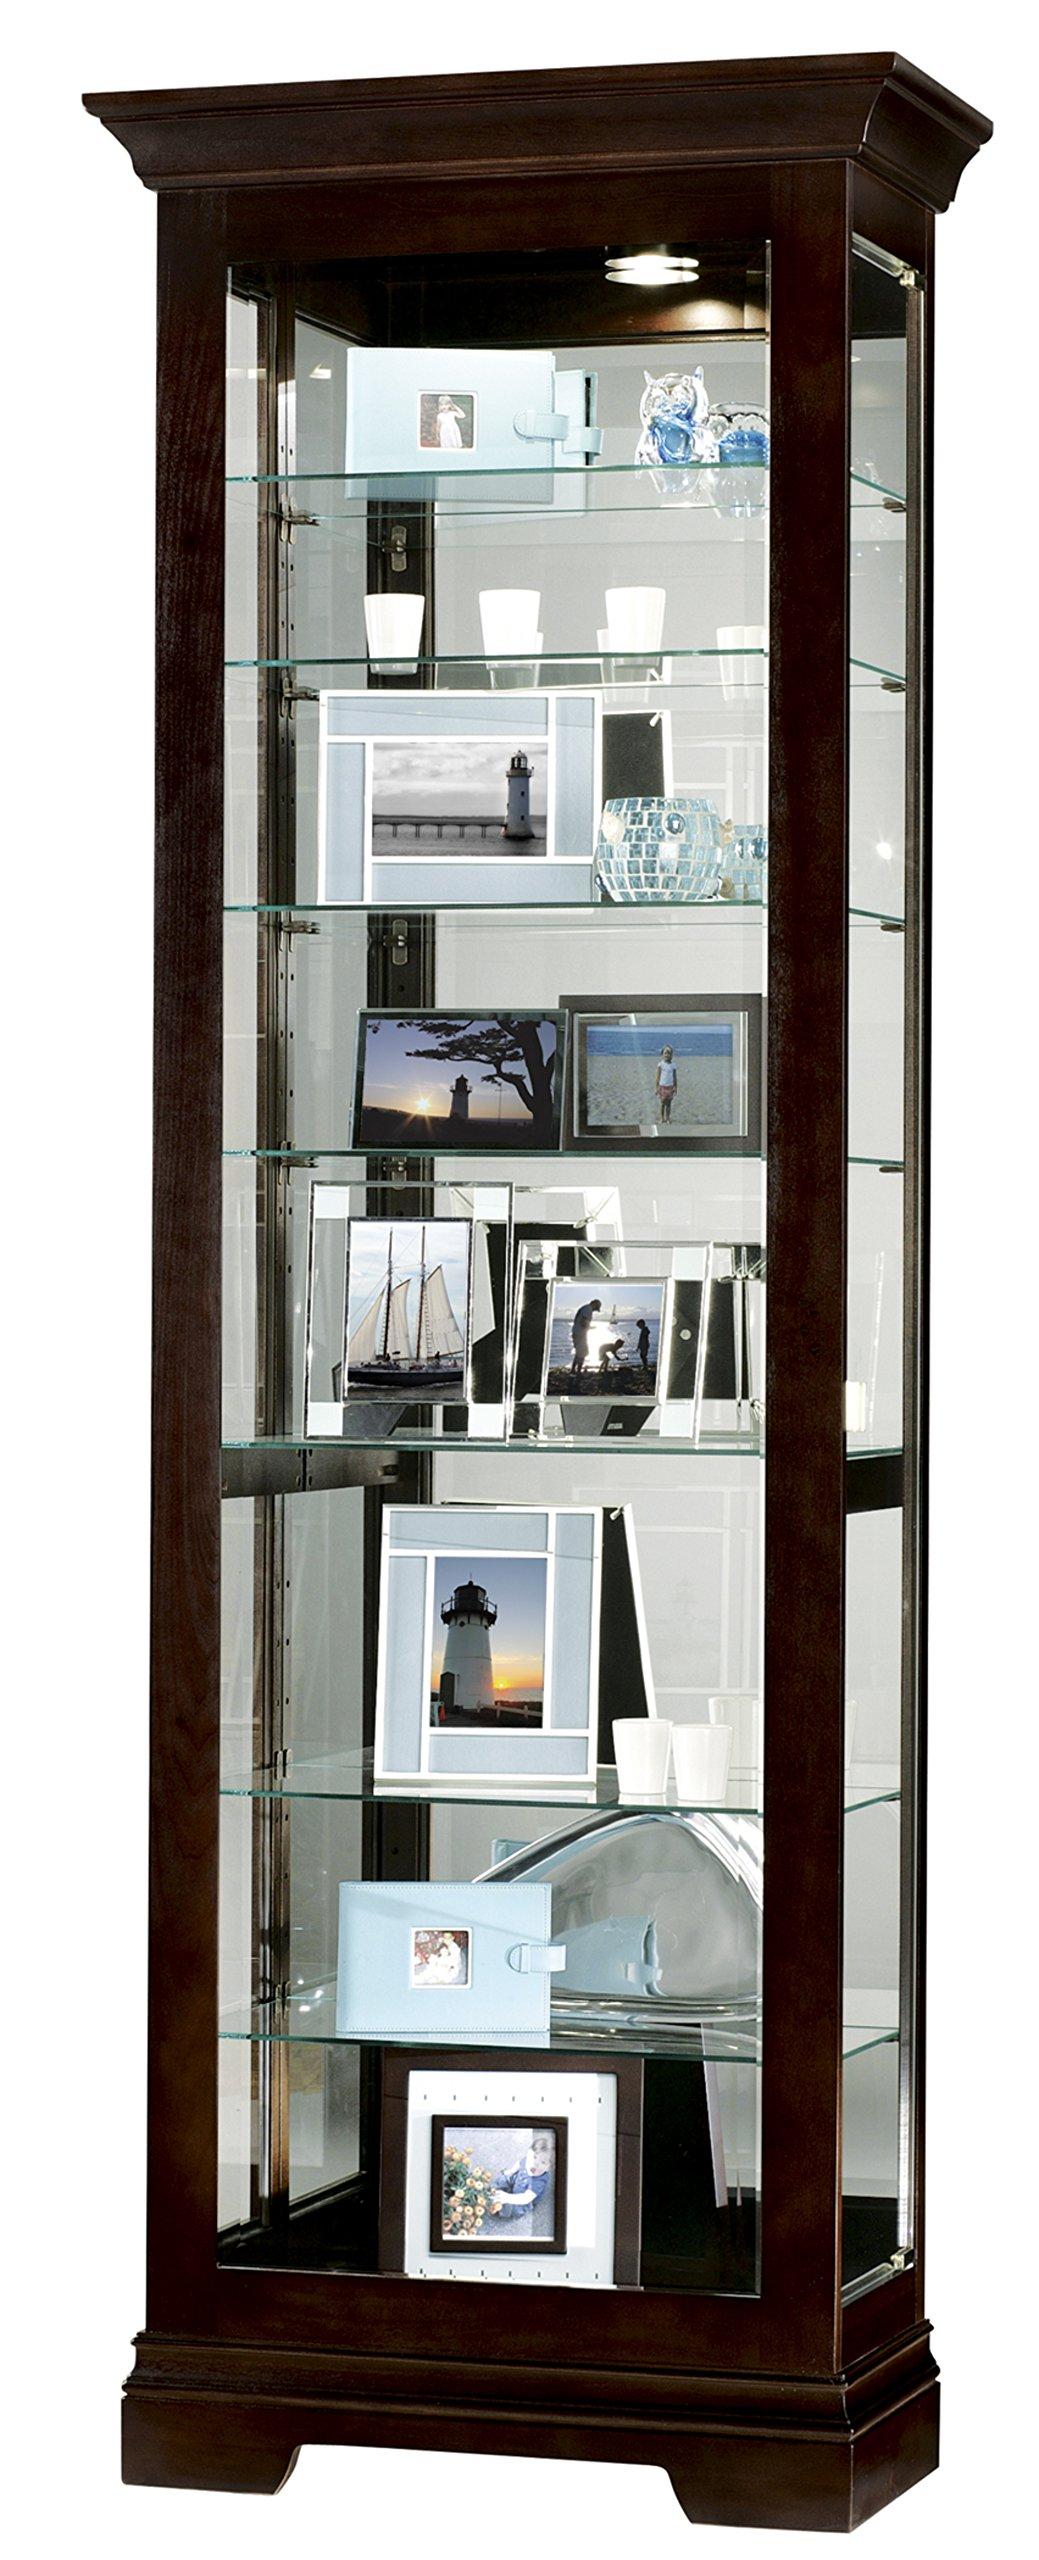 Howard Miller 680-412 Saloman Curio Cabinet by Howard Miller